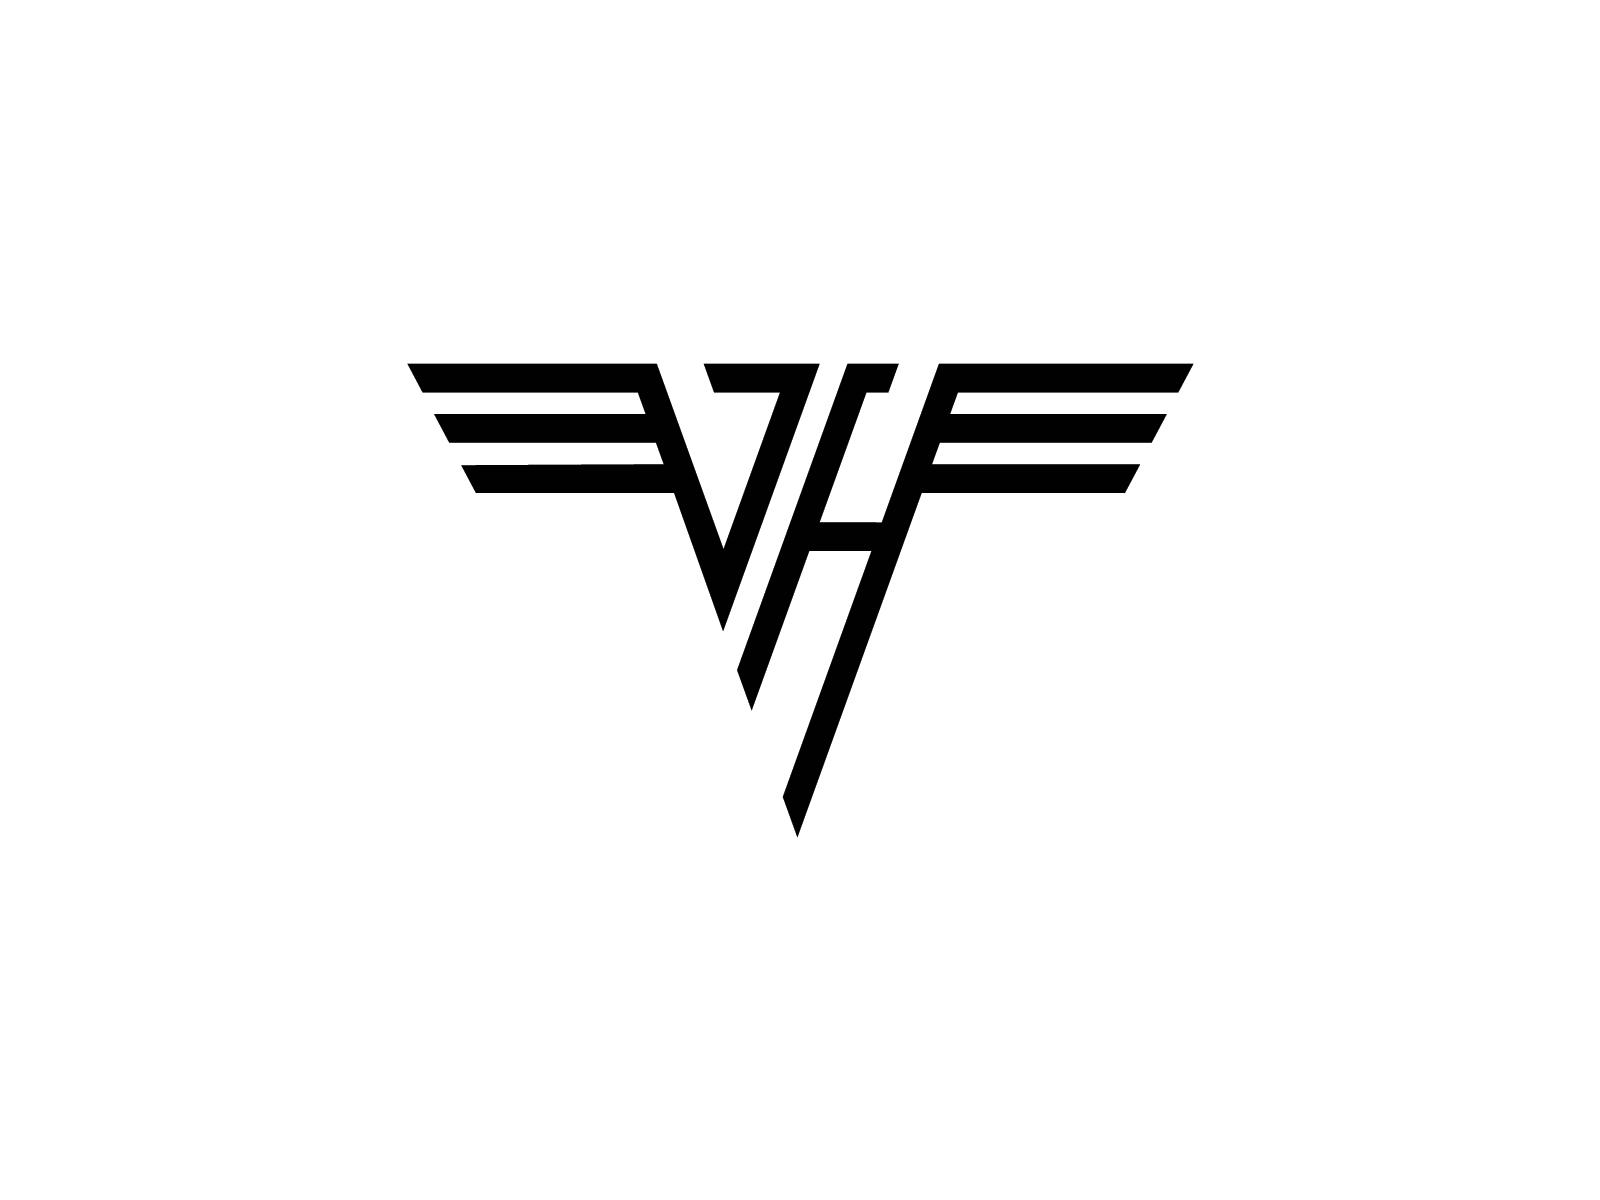 van halen logos rh logolynx com make a band logo free make a band logo generator